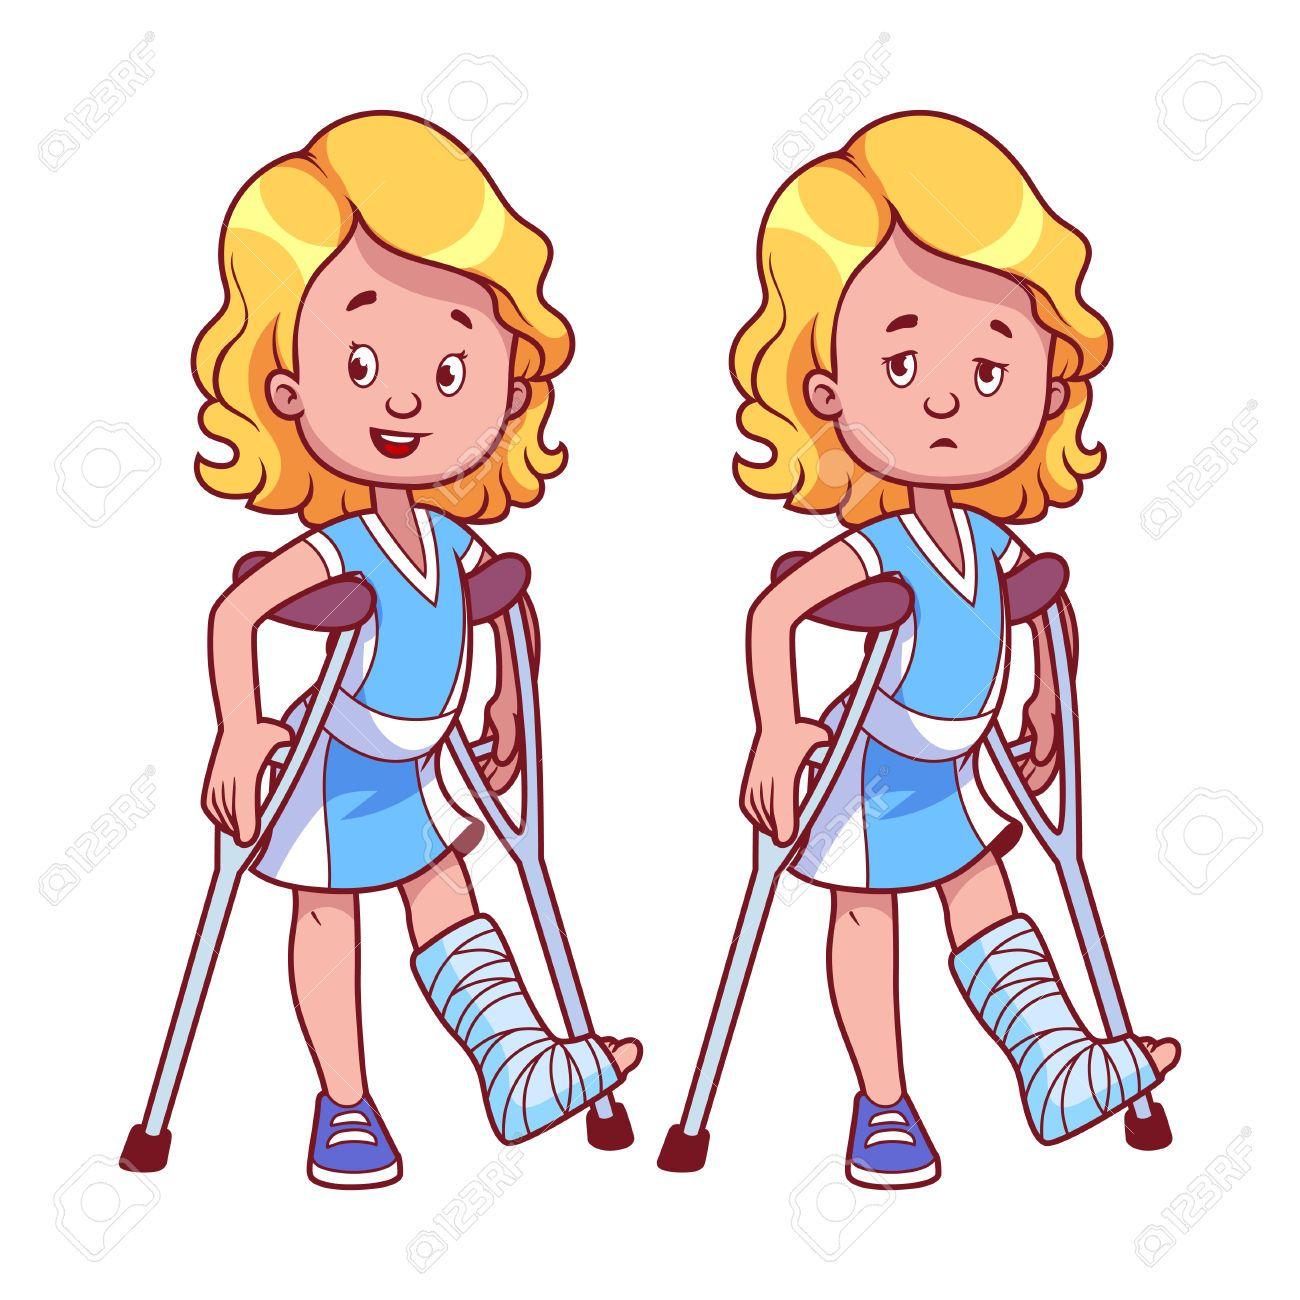 broken leg clipart at getdrawings com free for personal use broken rh getdrawings com broken leg clipart free boy broken leg clipart